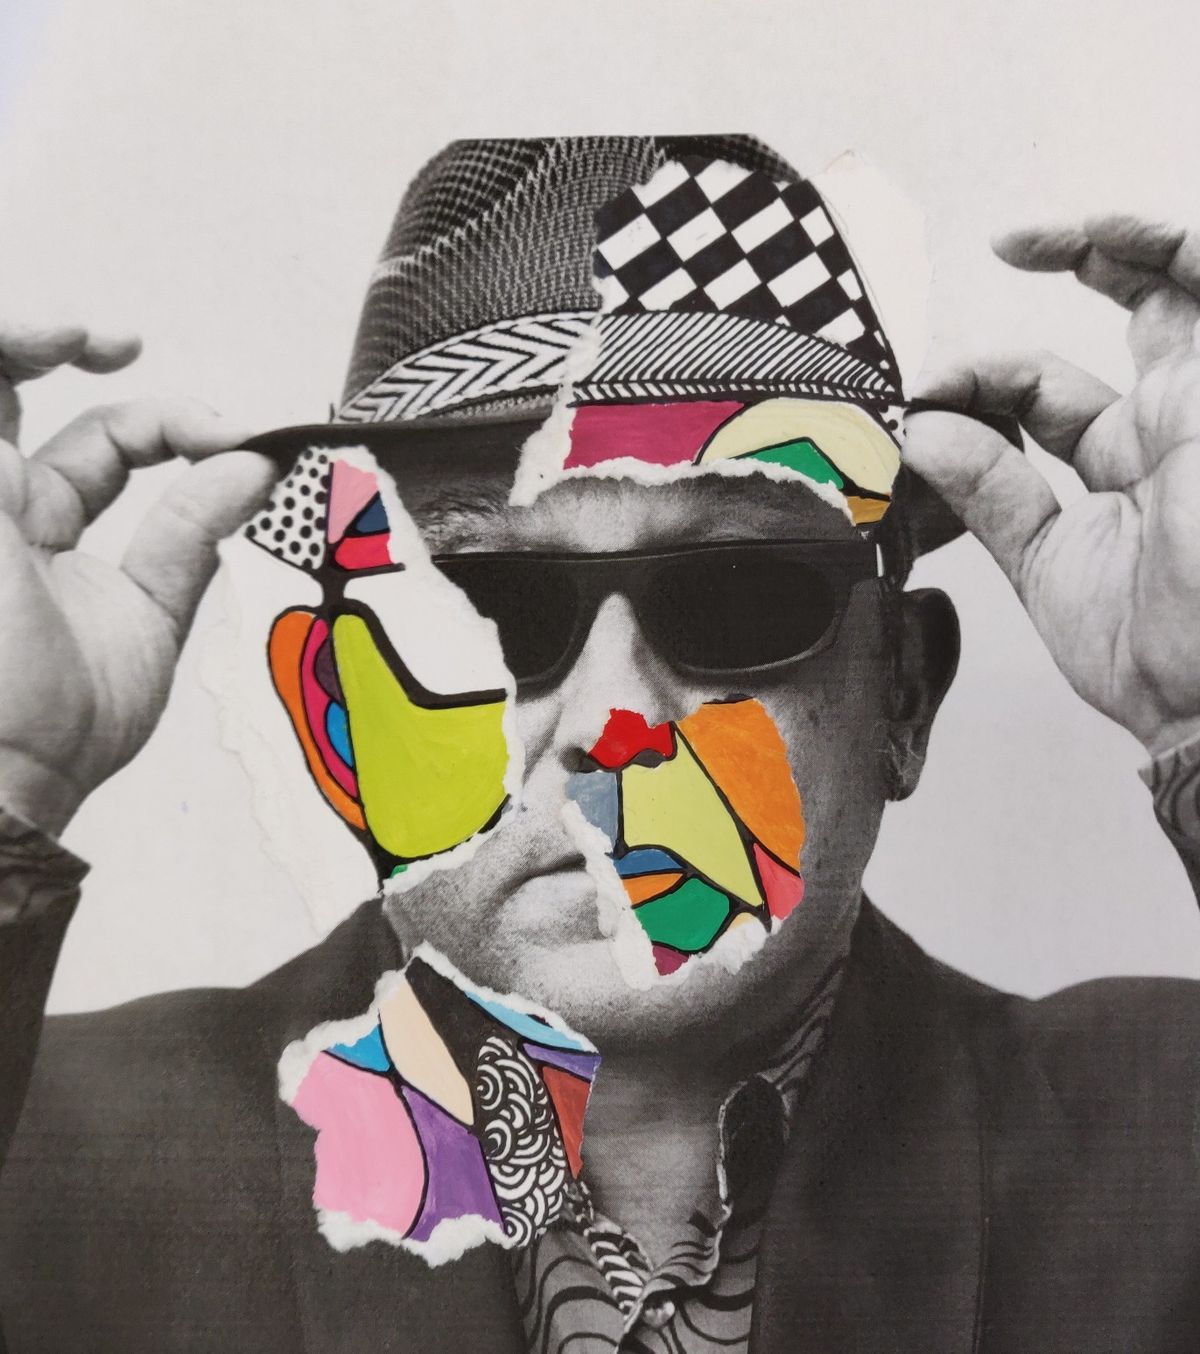 Combo collage painting, style Antonio Colomboni, 2018